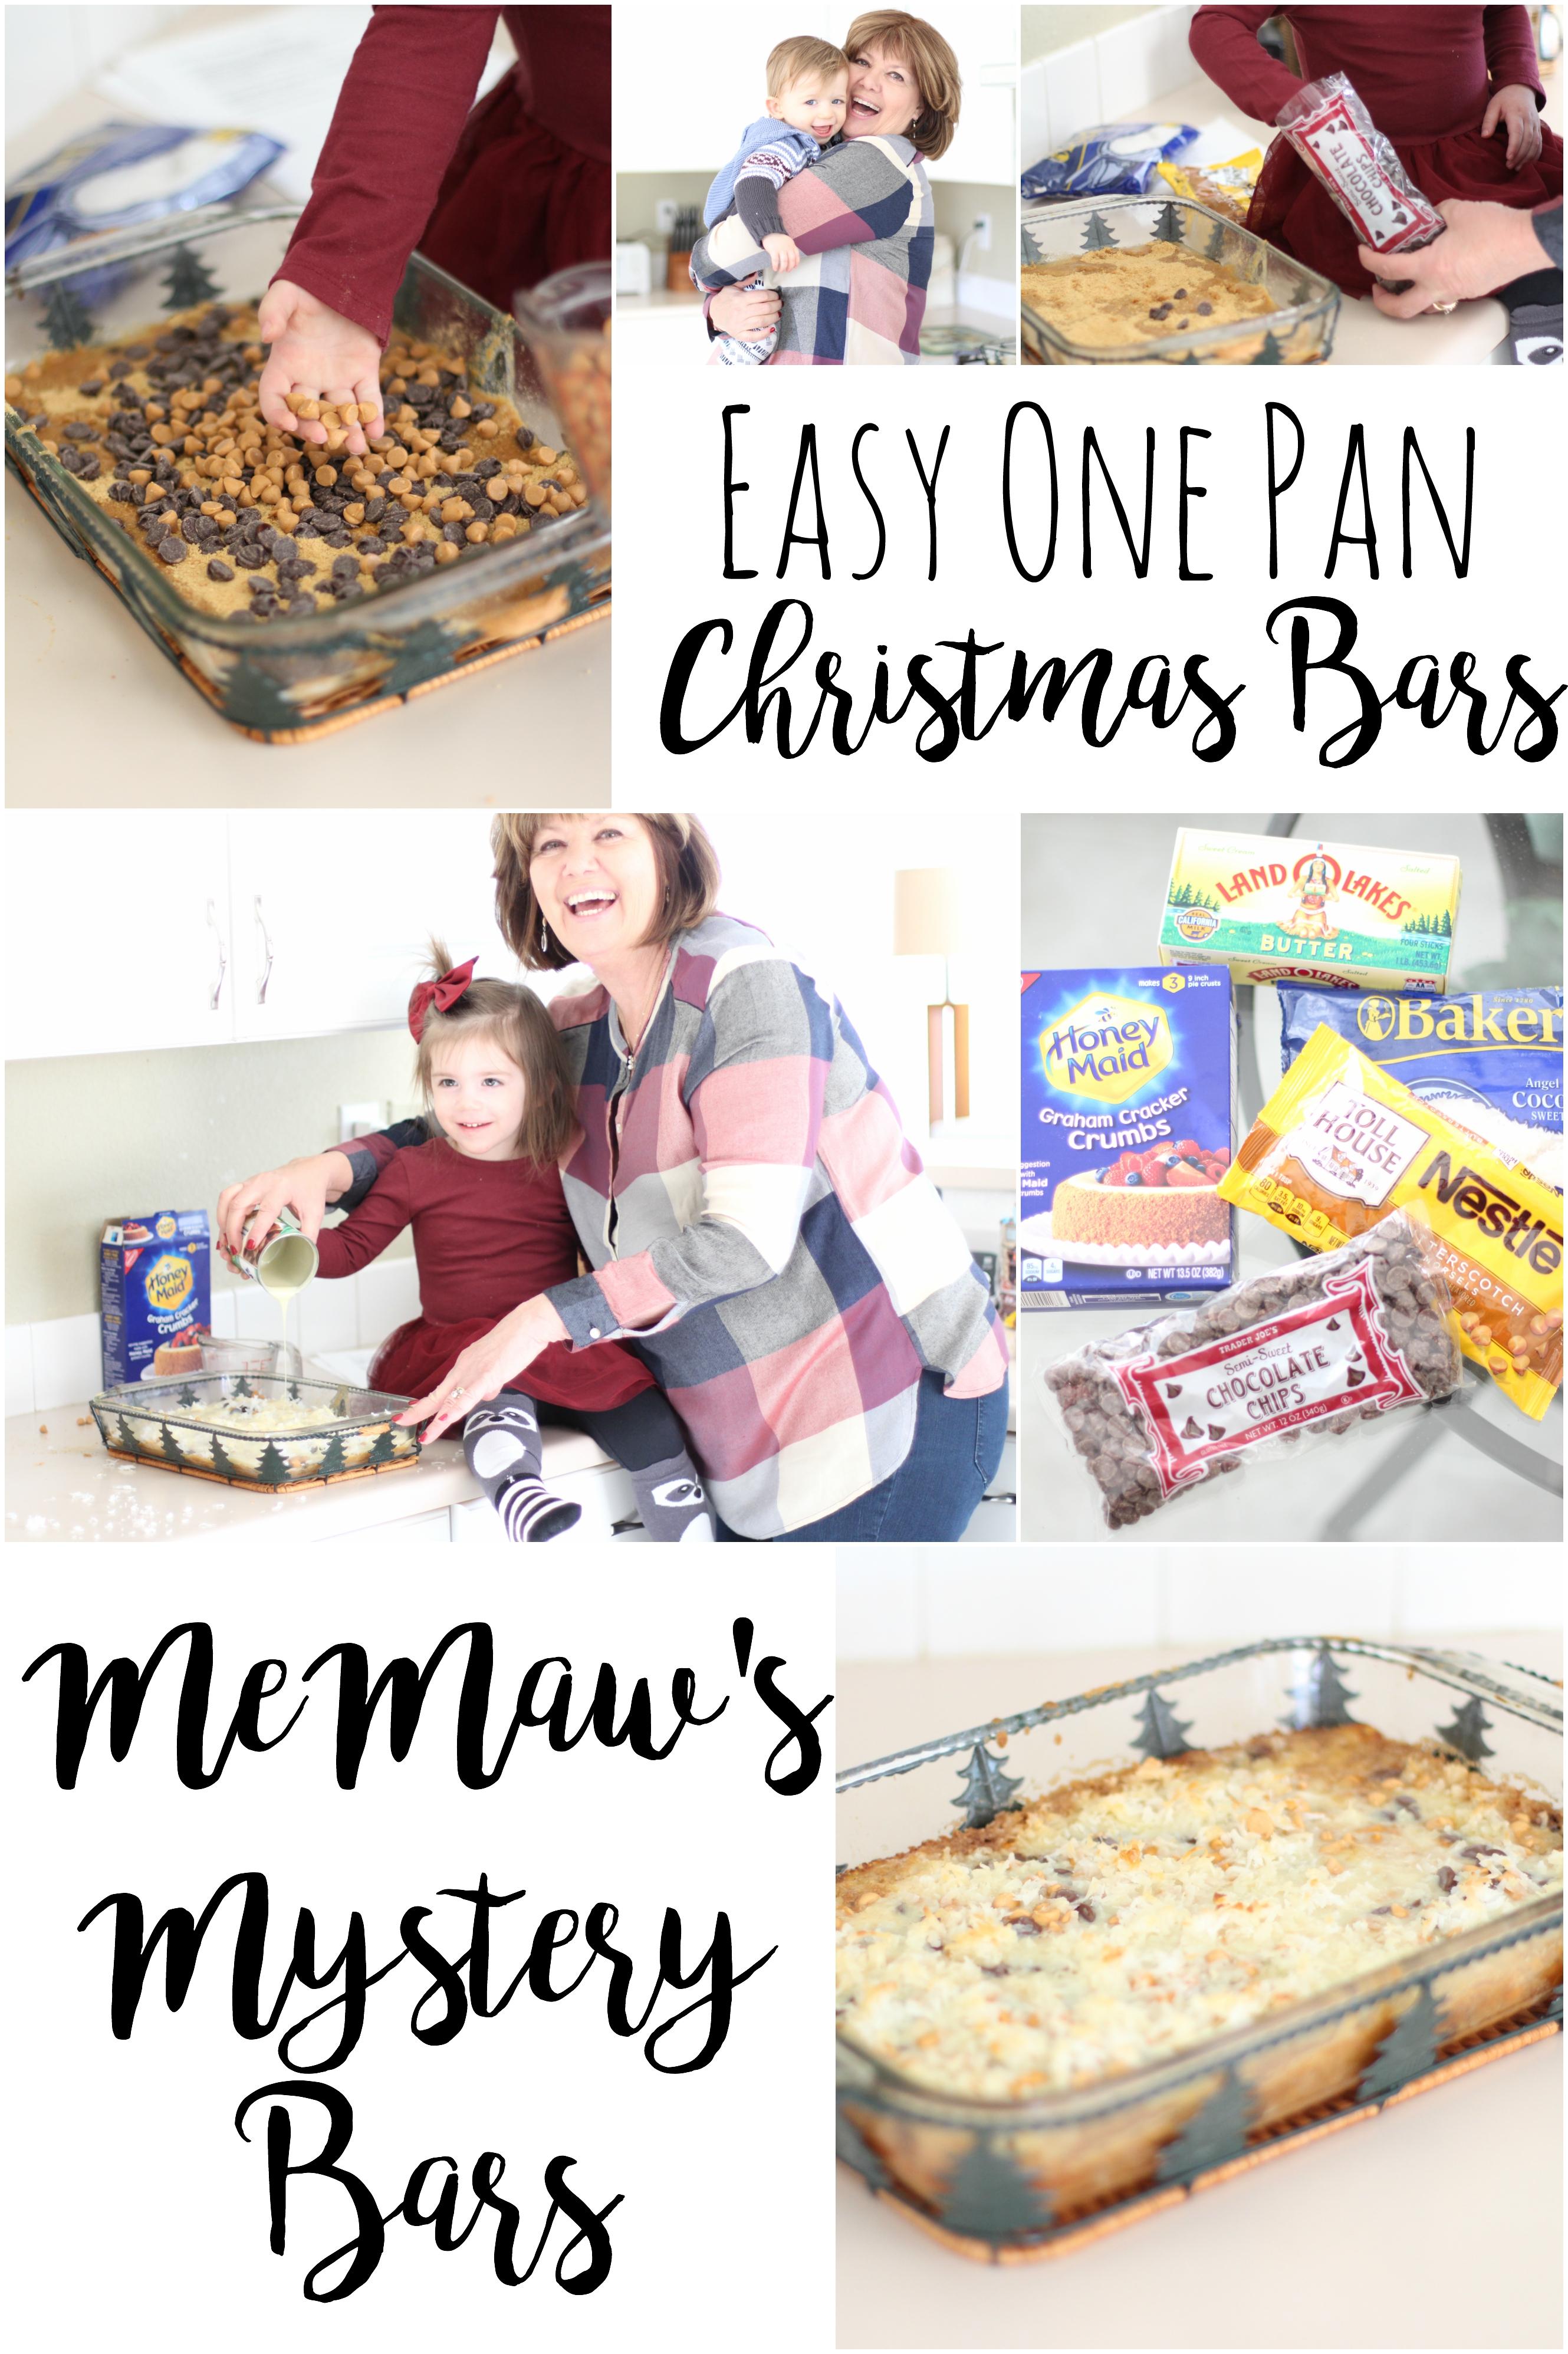 Easy One Pan Christmas Bars: MeMaw's Mystery Bars